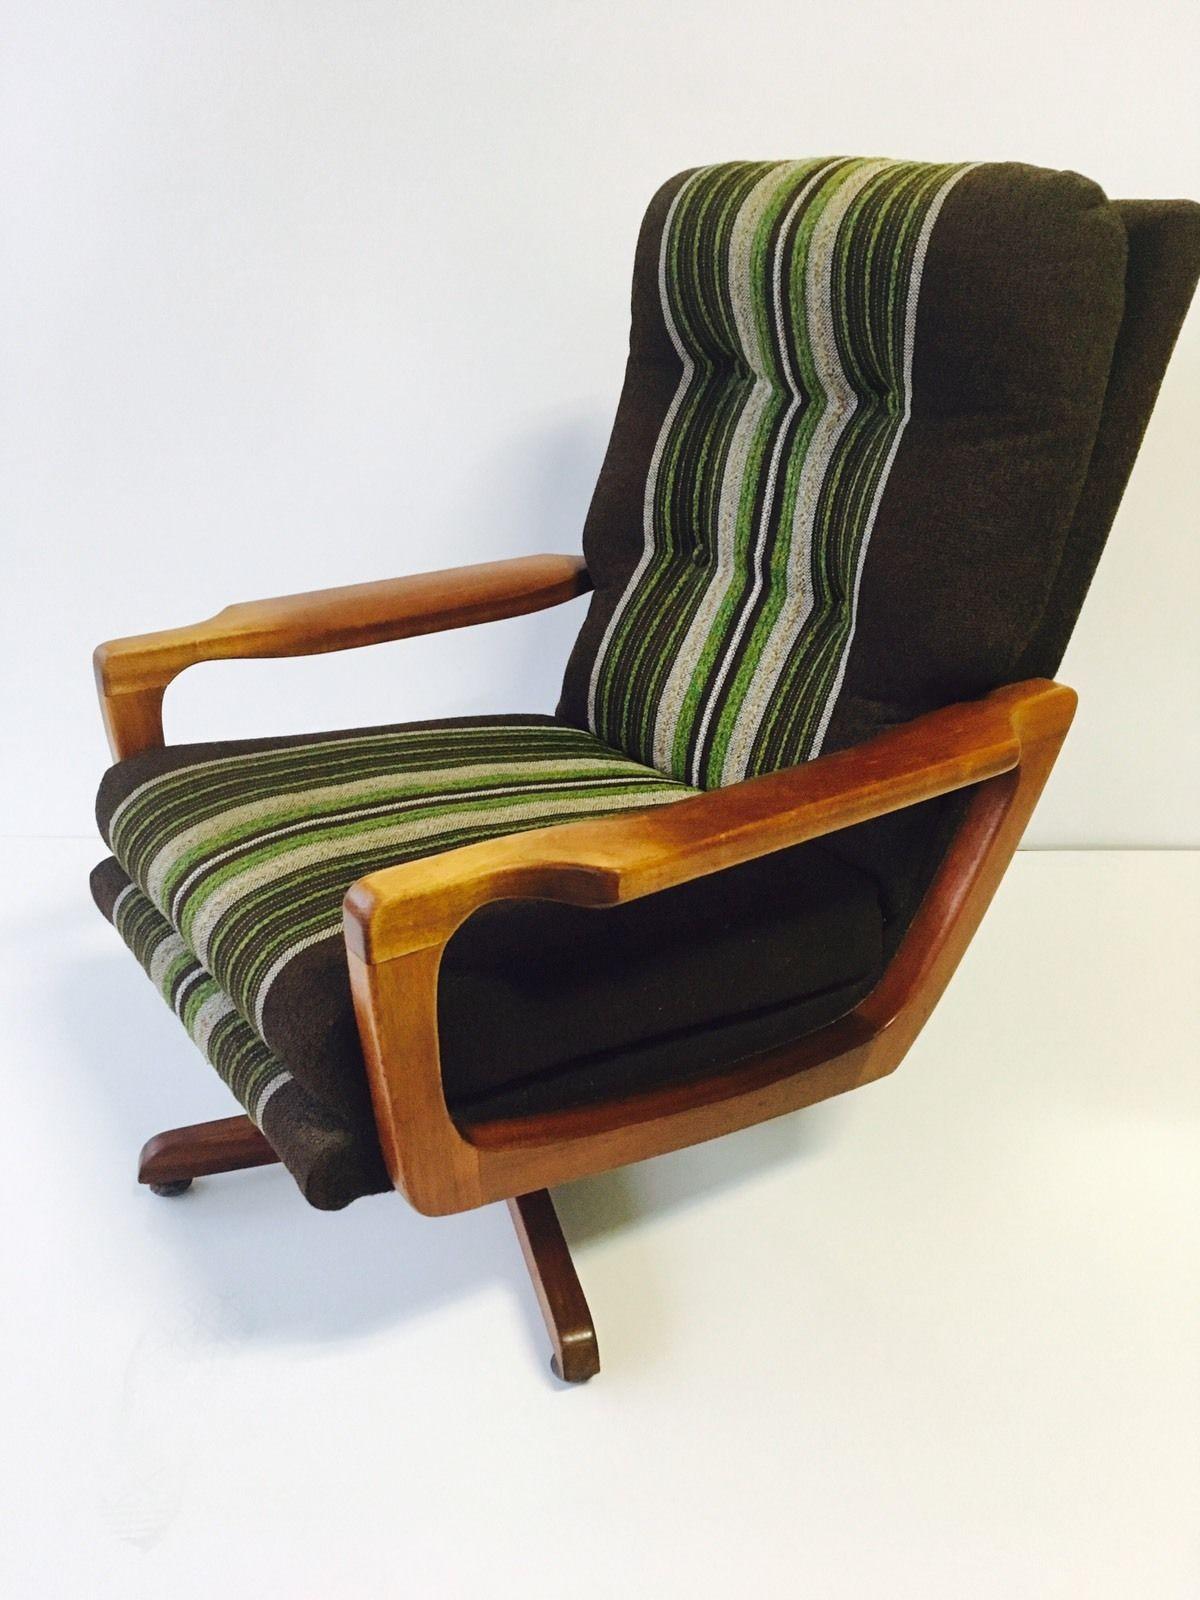 Astonishing Mid Century Modern Vintage Retro Armchair Parker Tessa Onthecornerstone Fun Painted Chair Ideas Images Onthecornerstoneorg